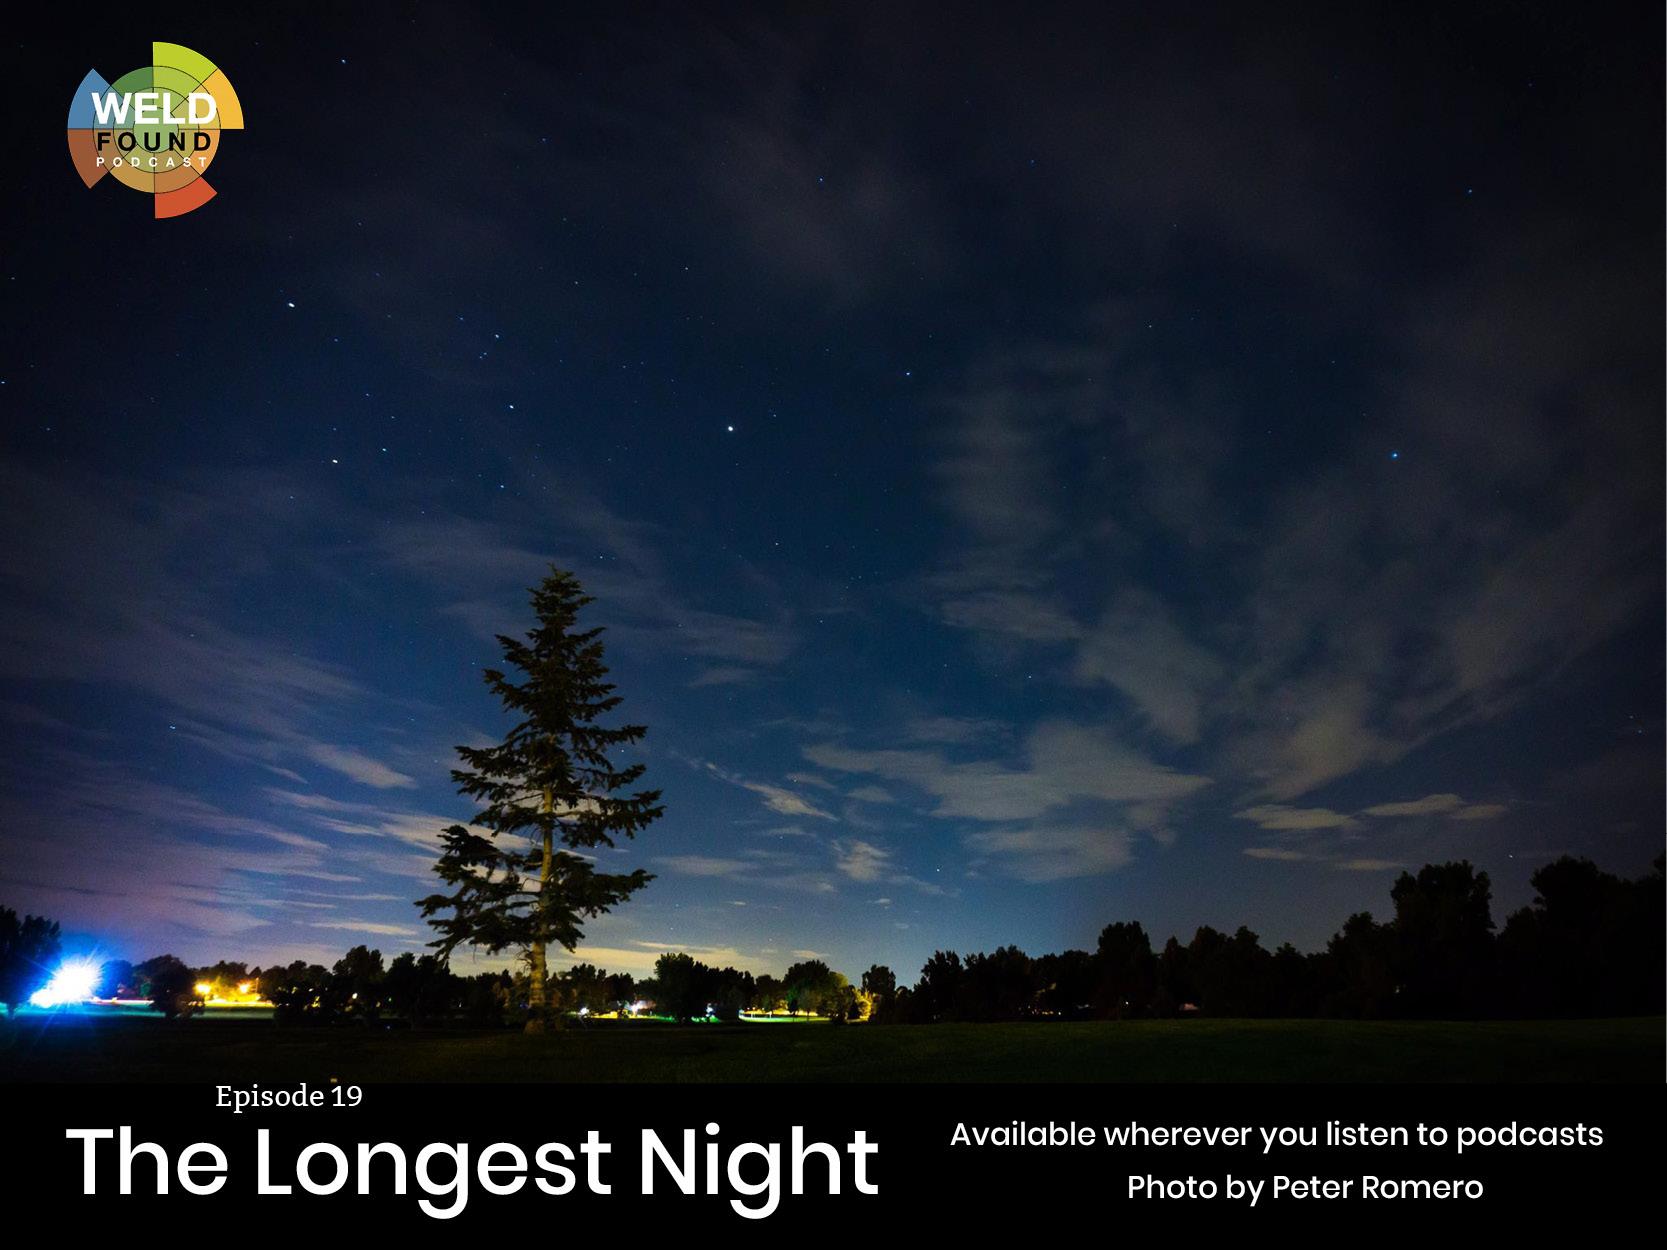 Weld Found Podcast: The Longest Night